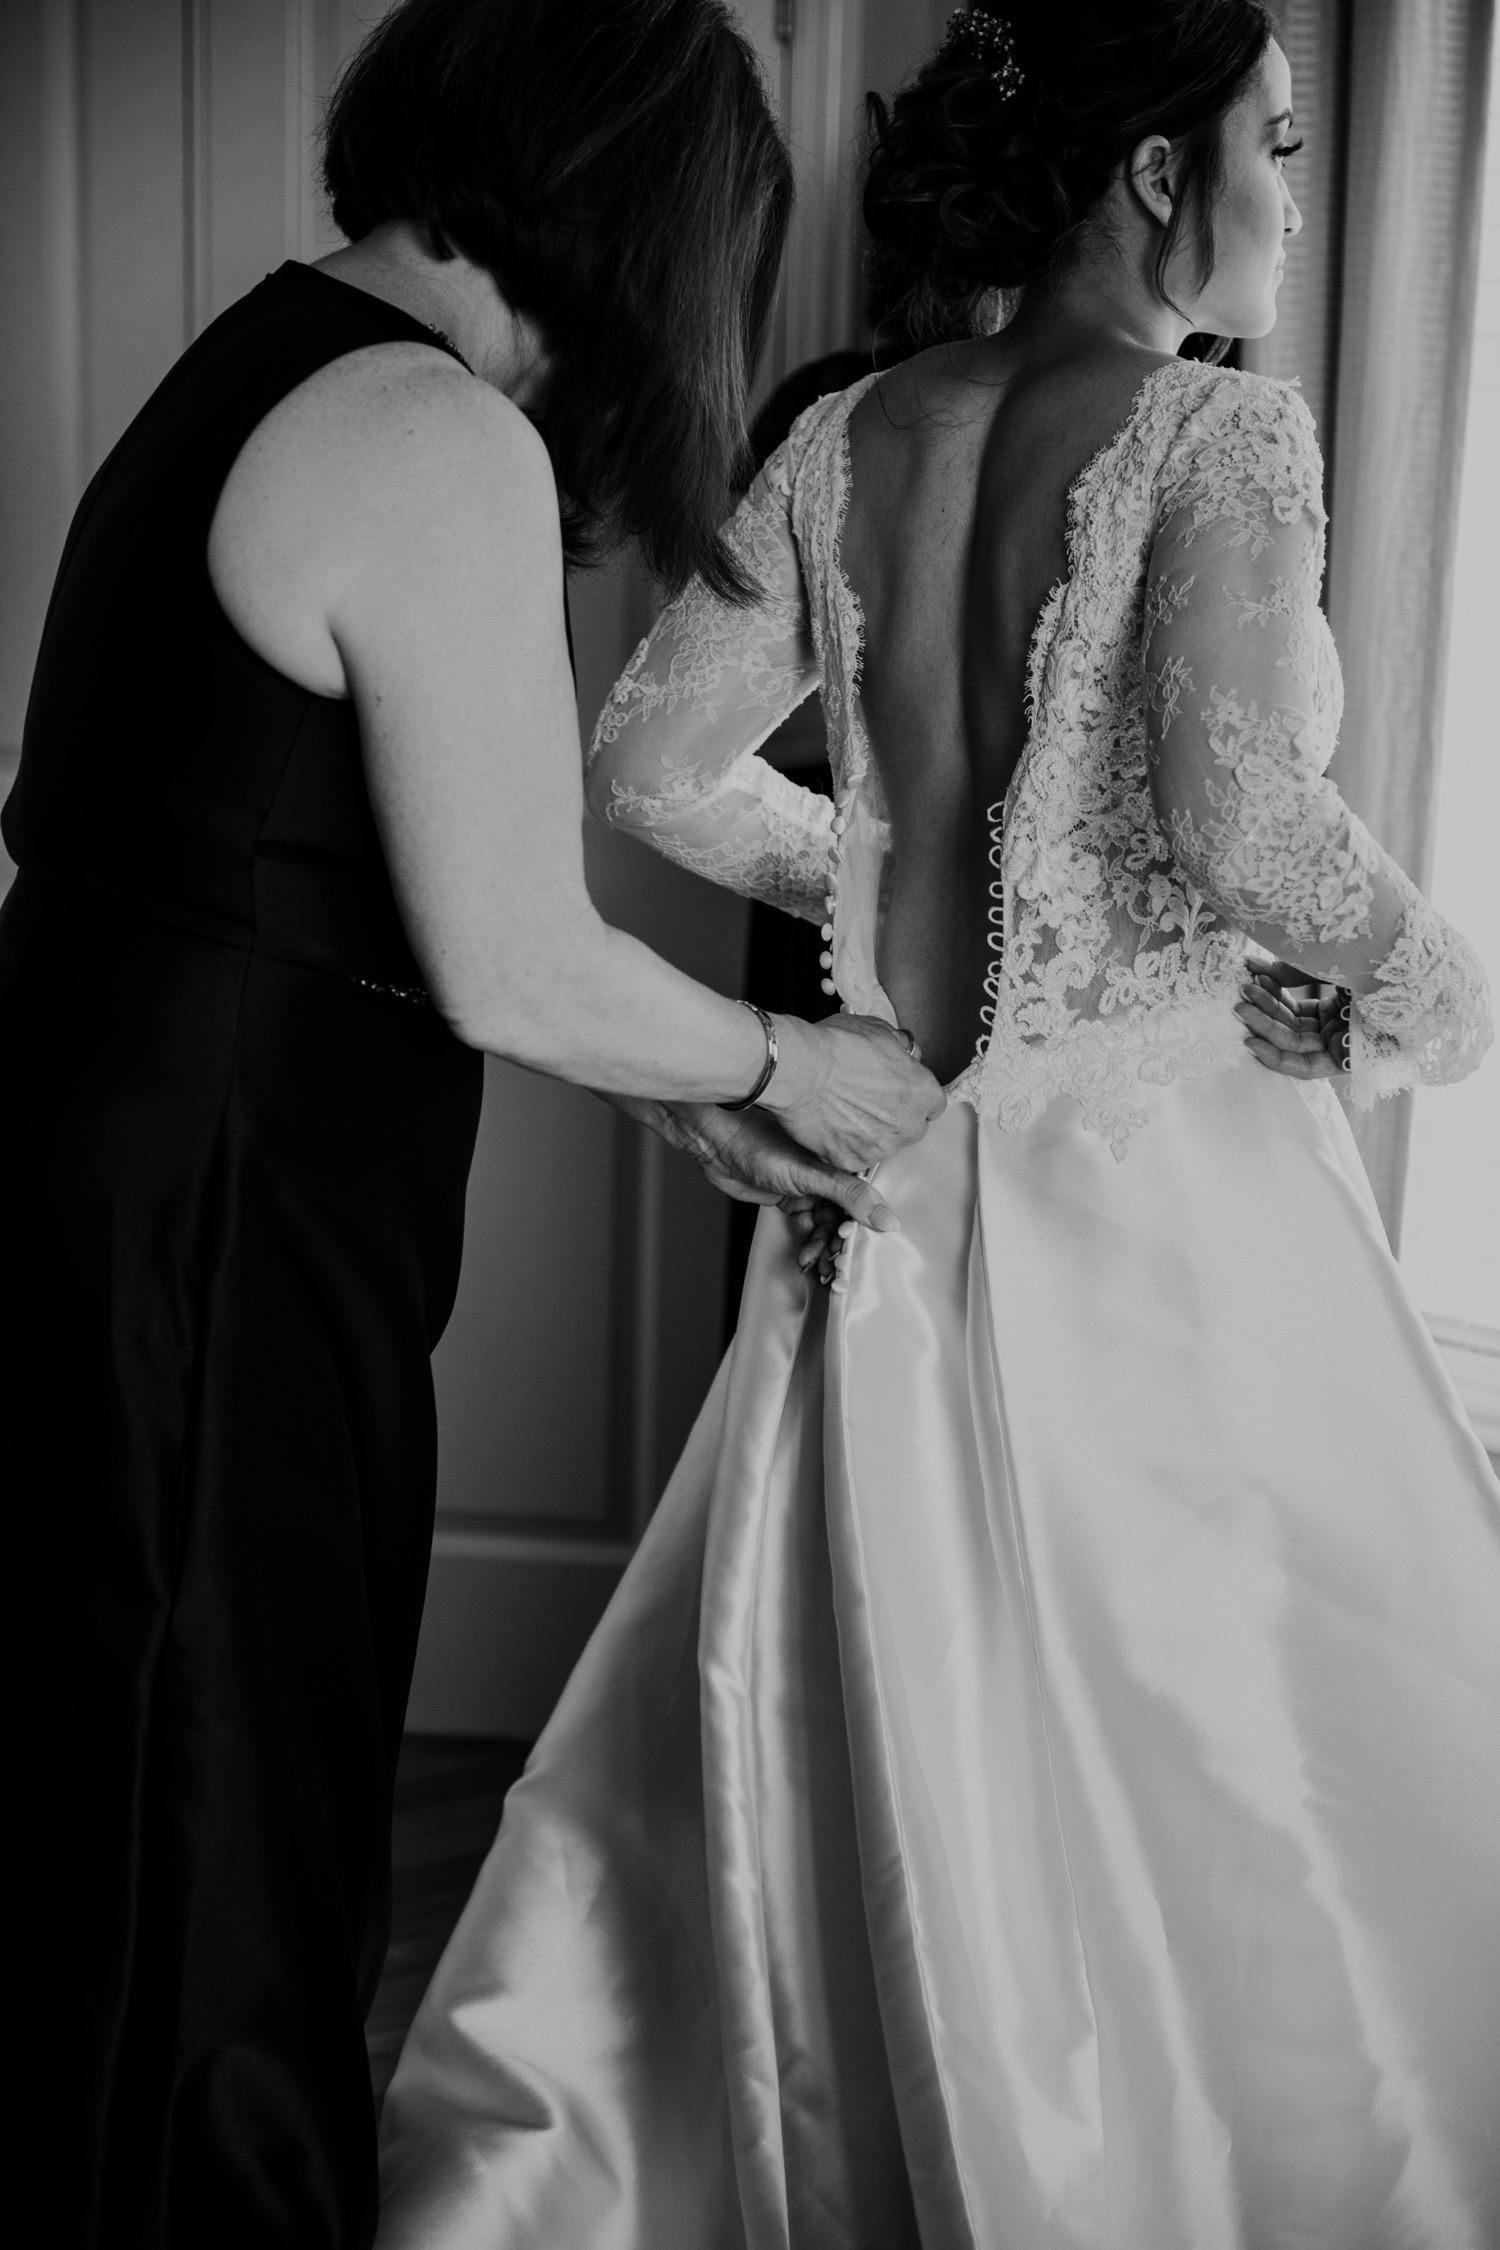 017_Hennings-220_Kansas_Kelsey_Center_Missouri_Wedding_Diane_Jackson's_Photography_Event_Marshall_City.jpg